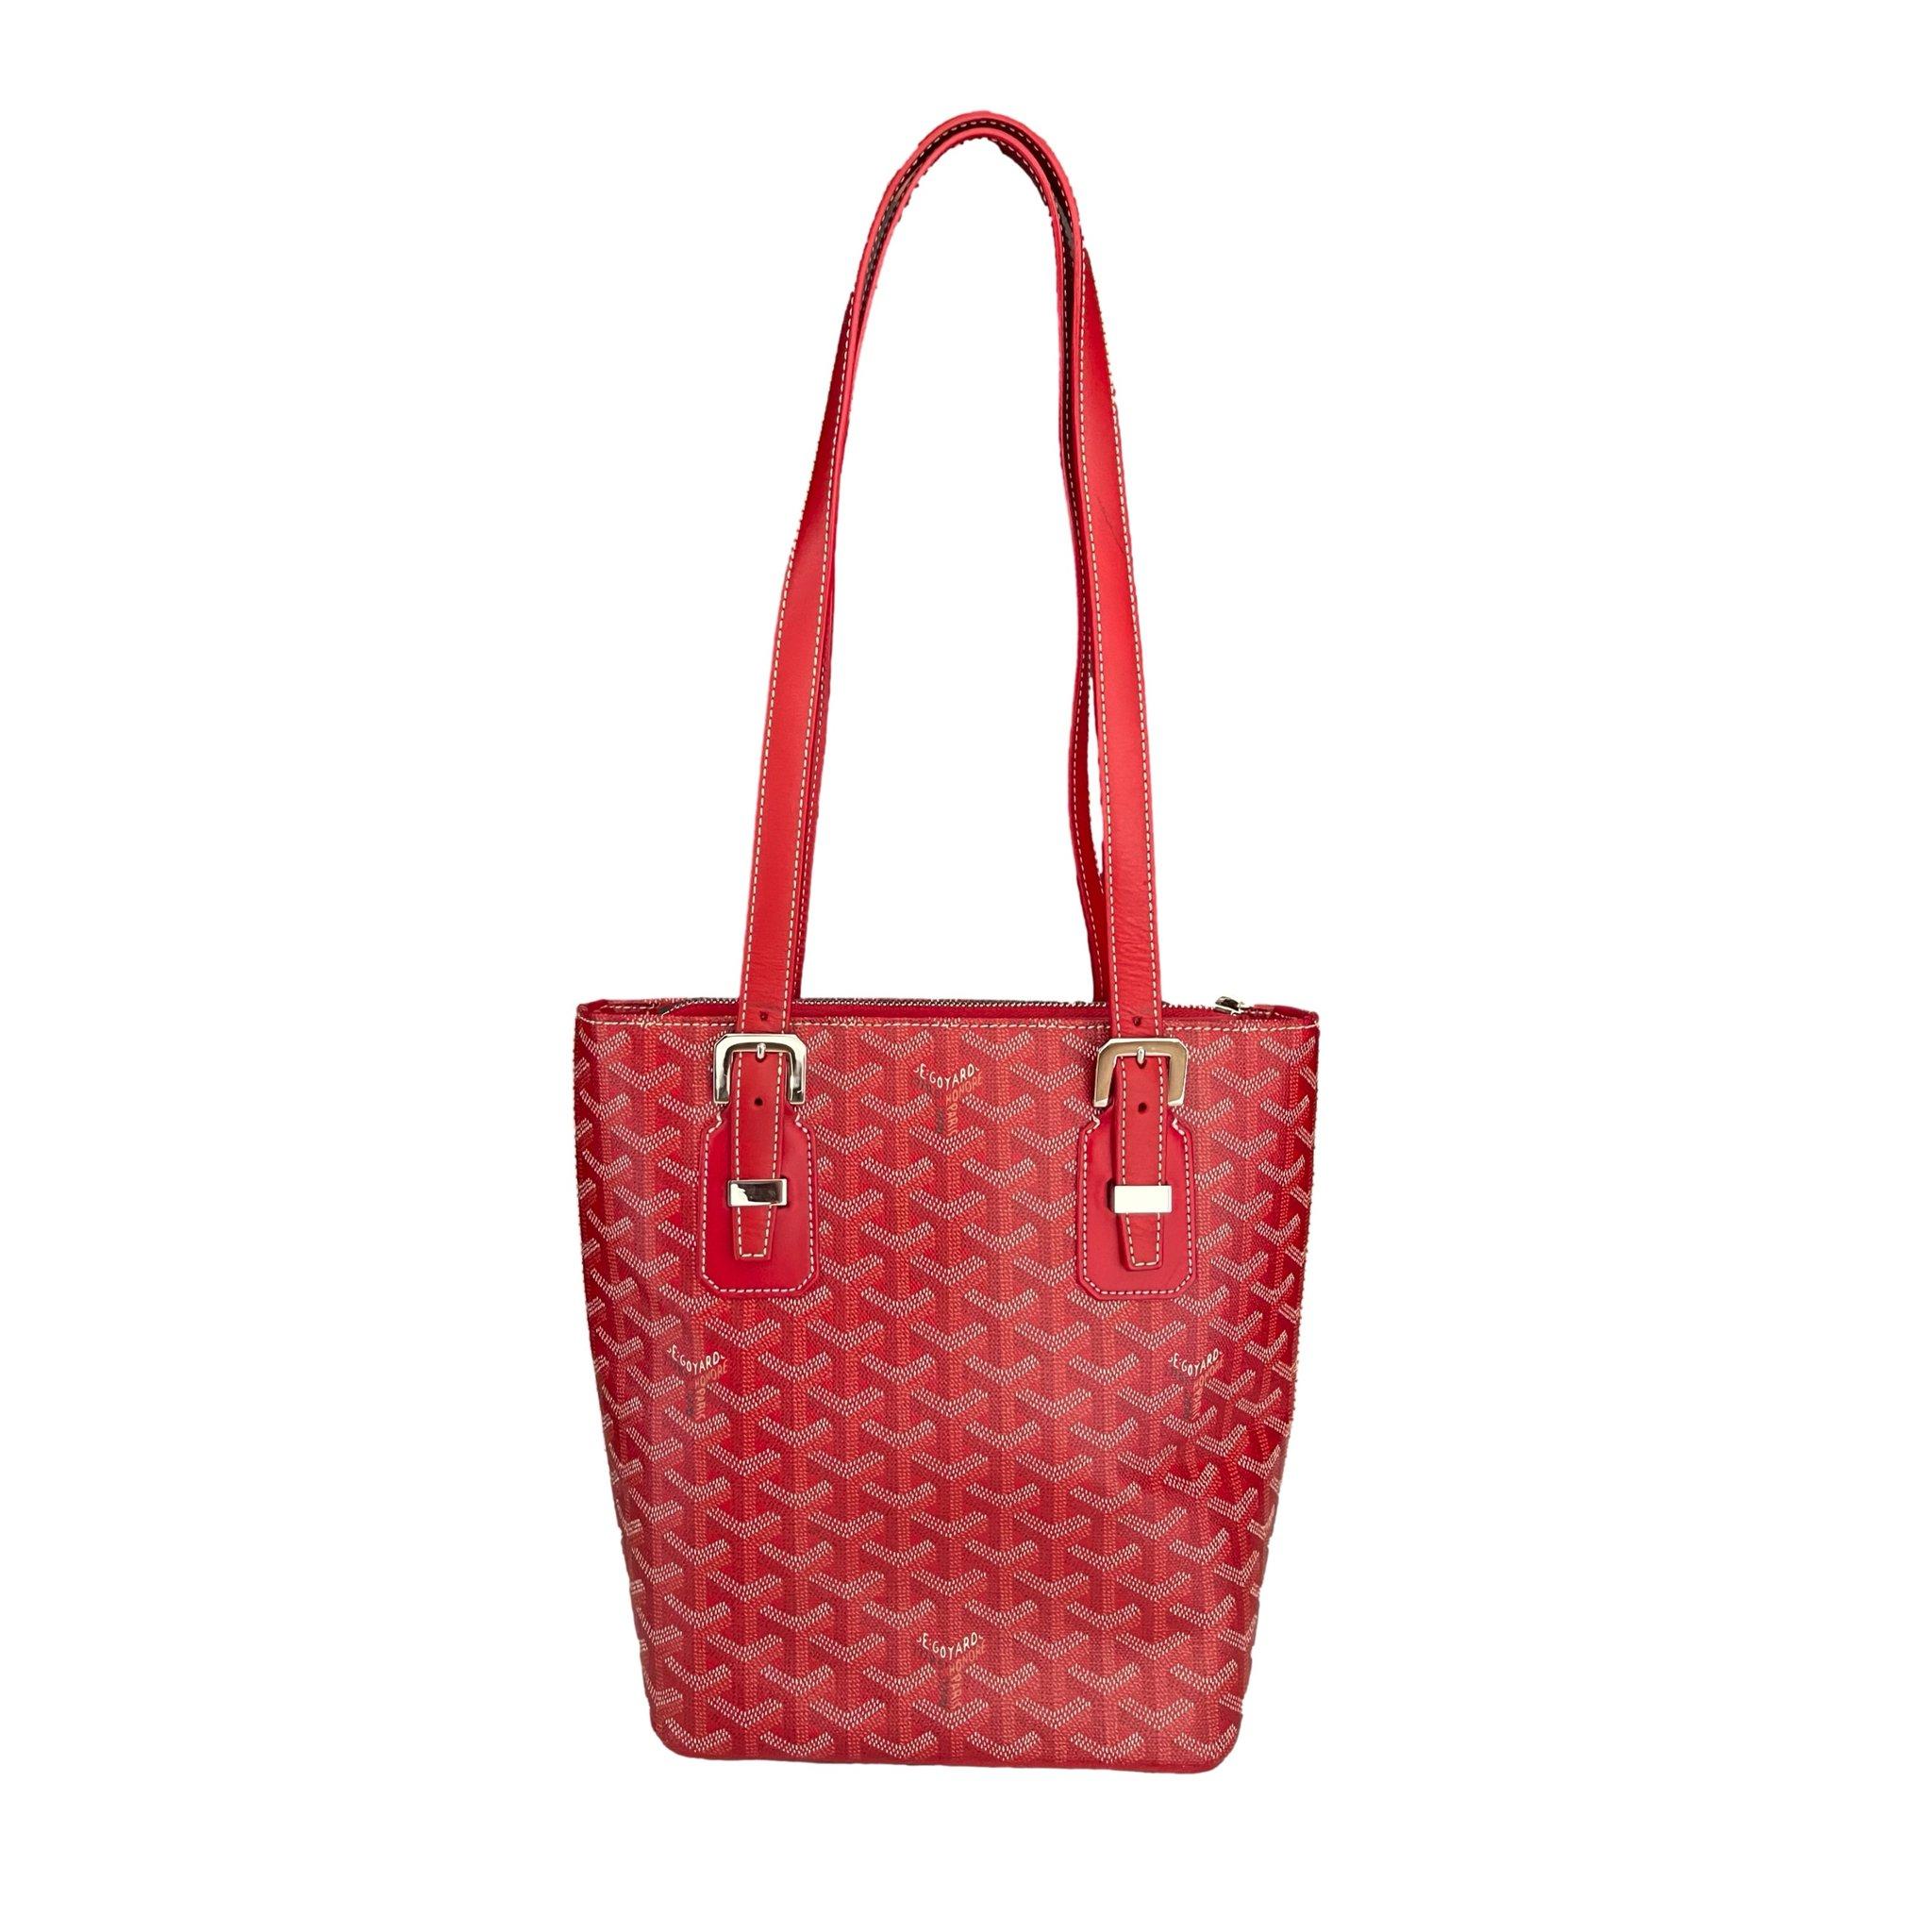 Goyard Red Monogram Tote by Treasures, available on treasuresofnewyorkcity.com for $1690 Bella Hadid Bags Exact Product